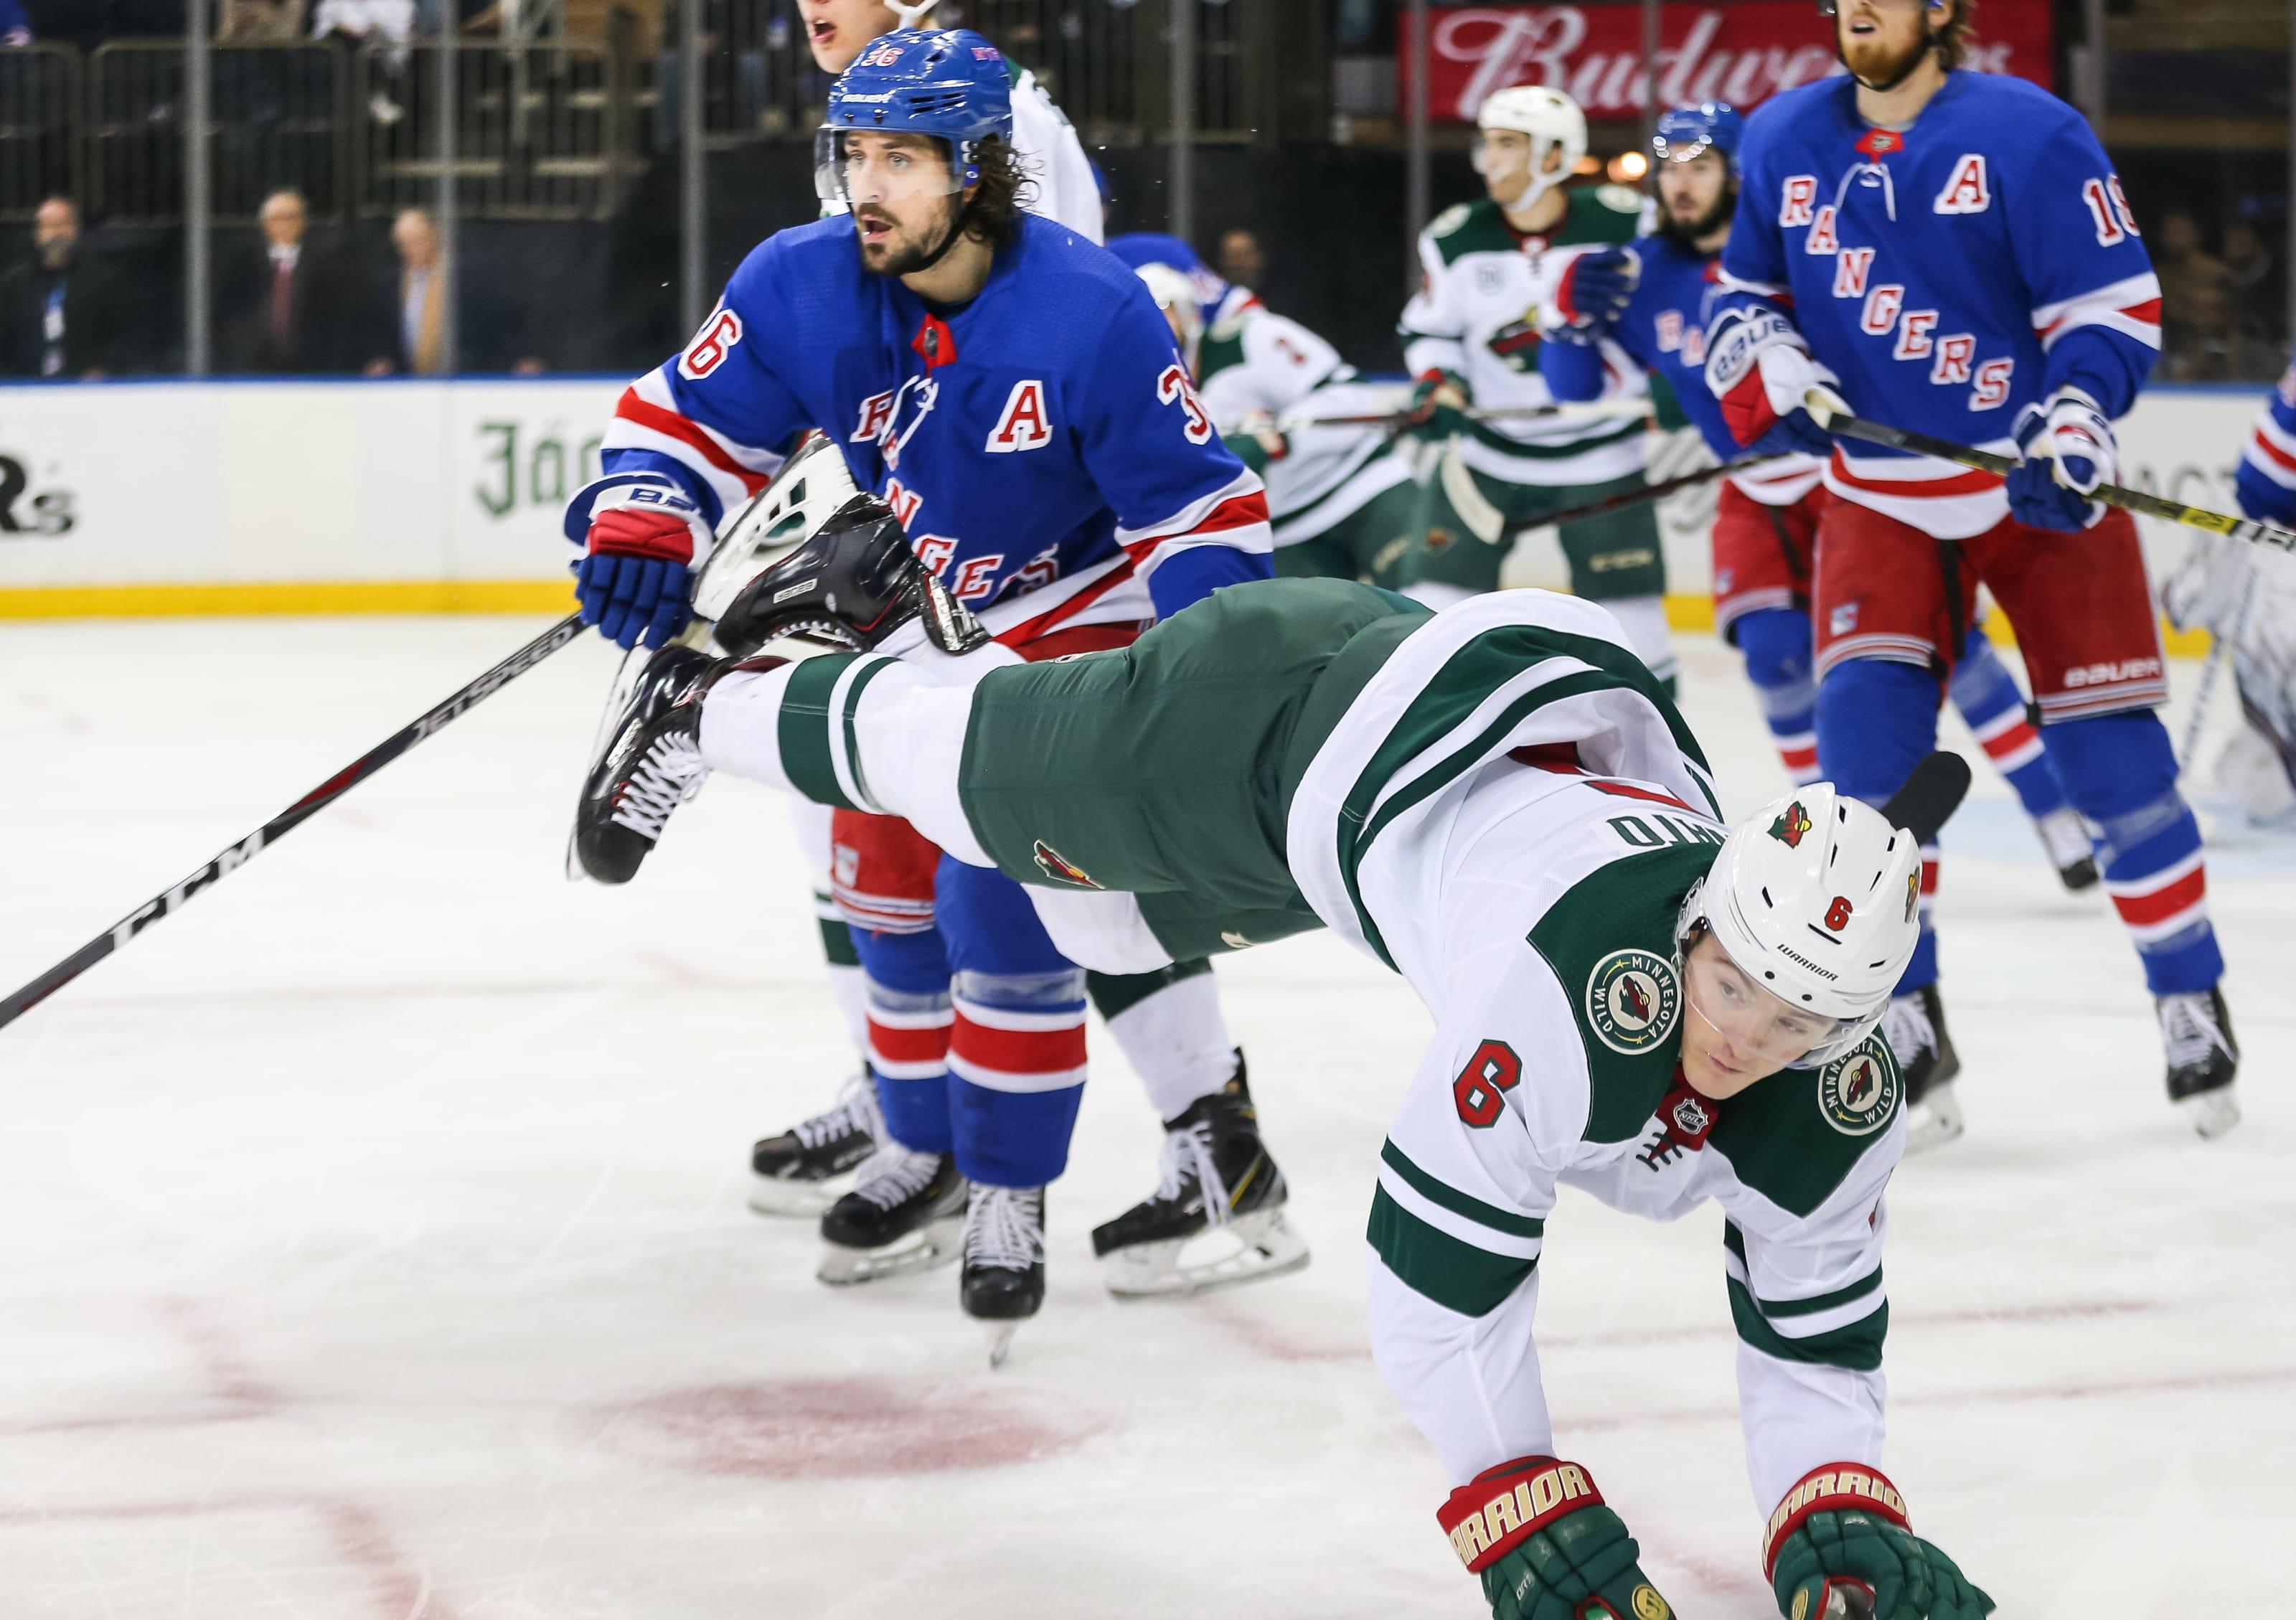 New York Rangers Trade Forward Mats Zuccarello To Dallas Stars